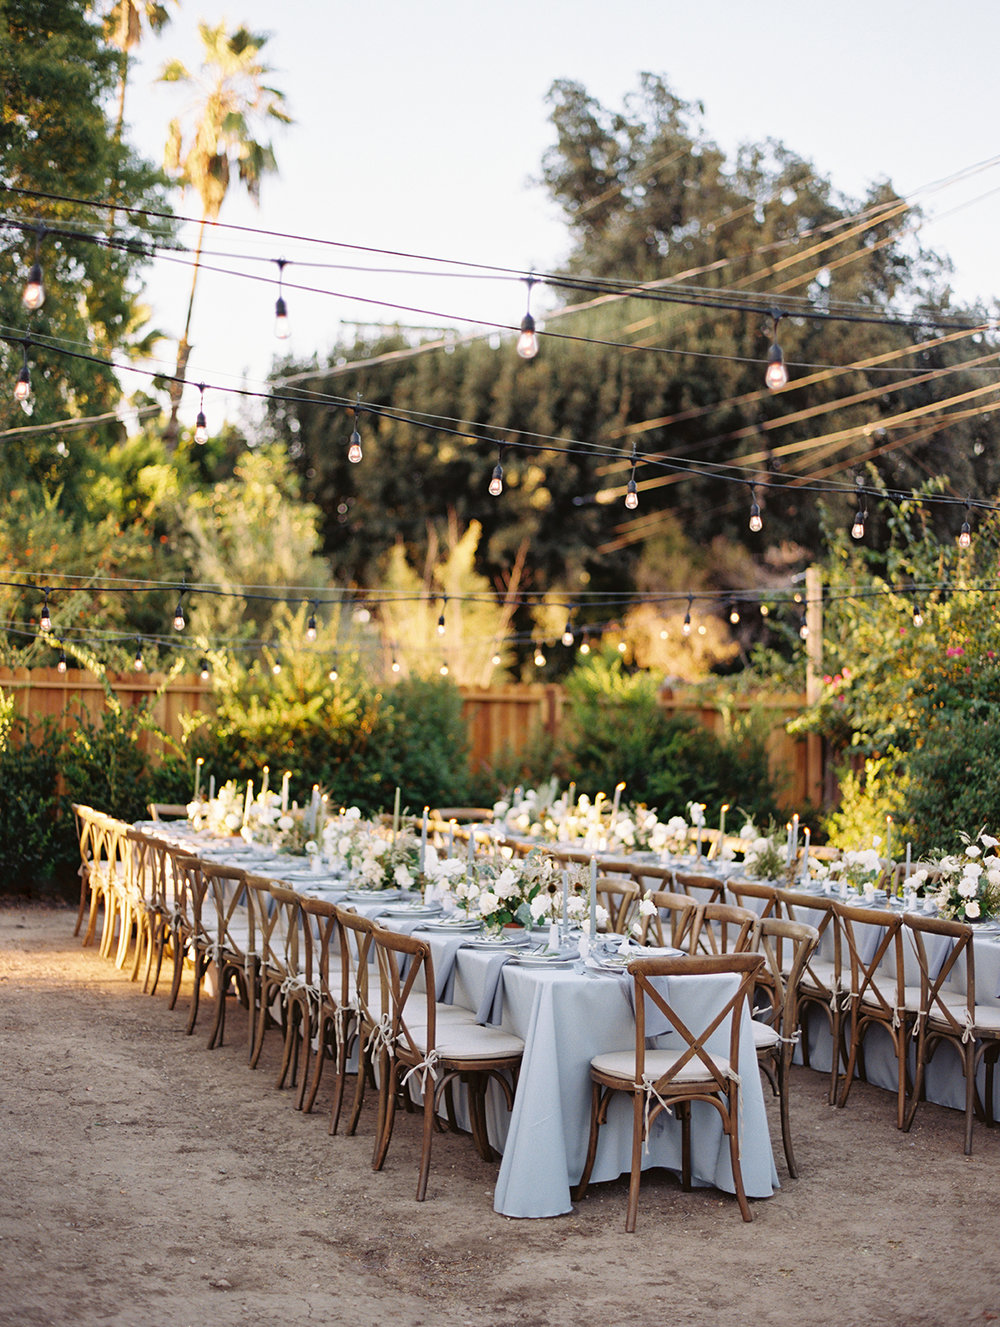 001-brian-sarra-los-angeles-wedding-brumley-wells-photography.jpg